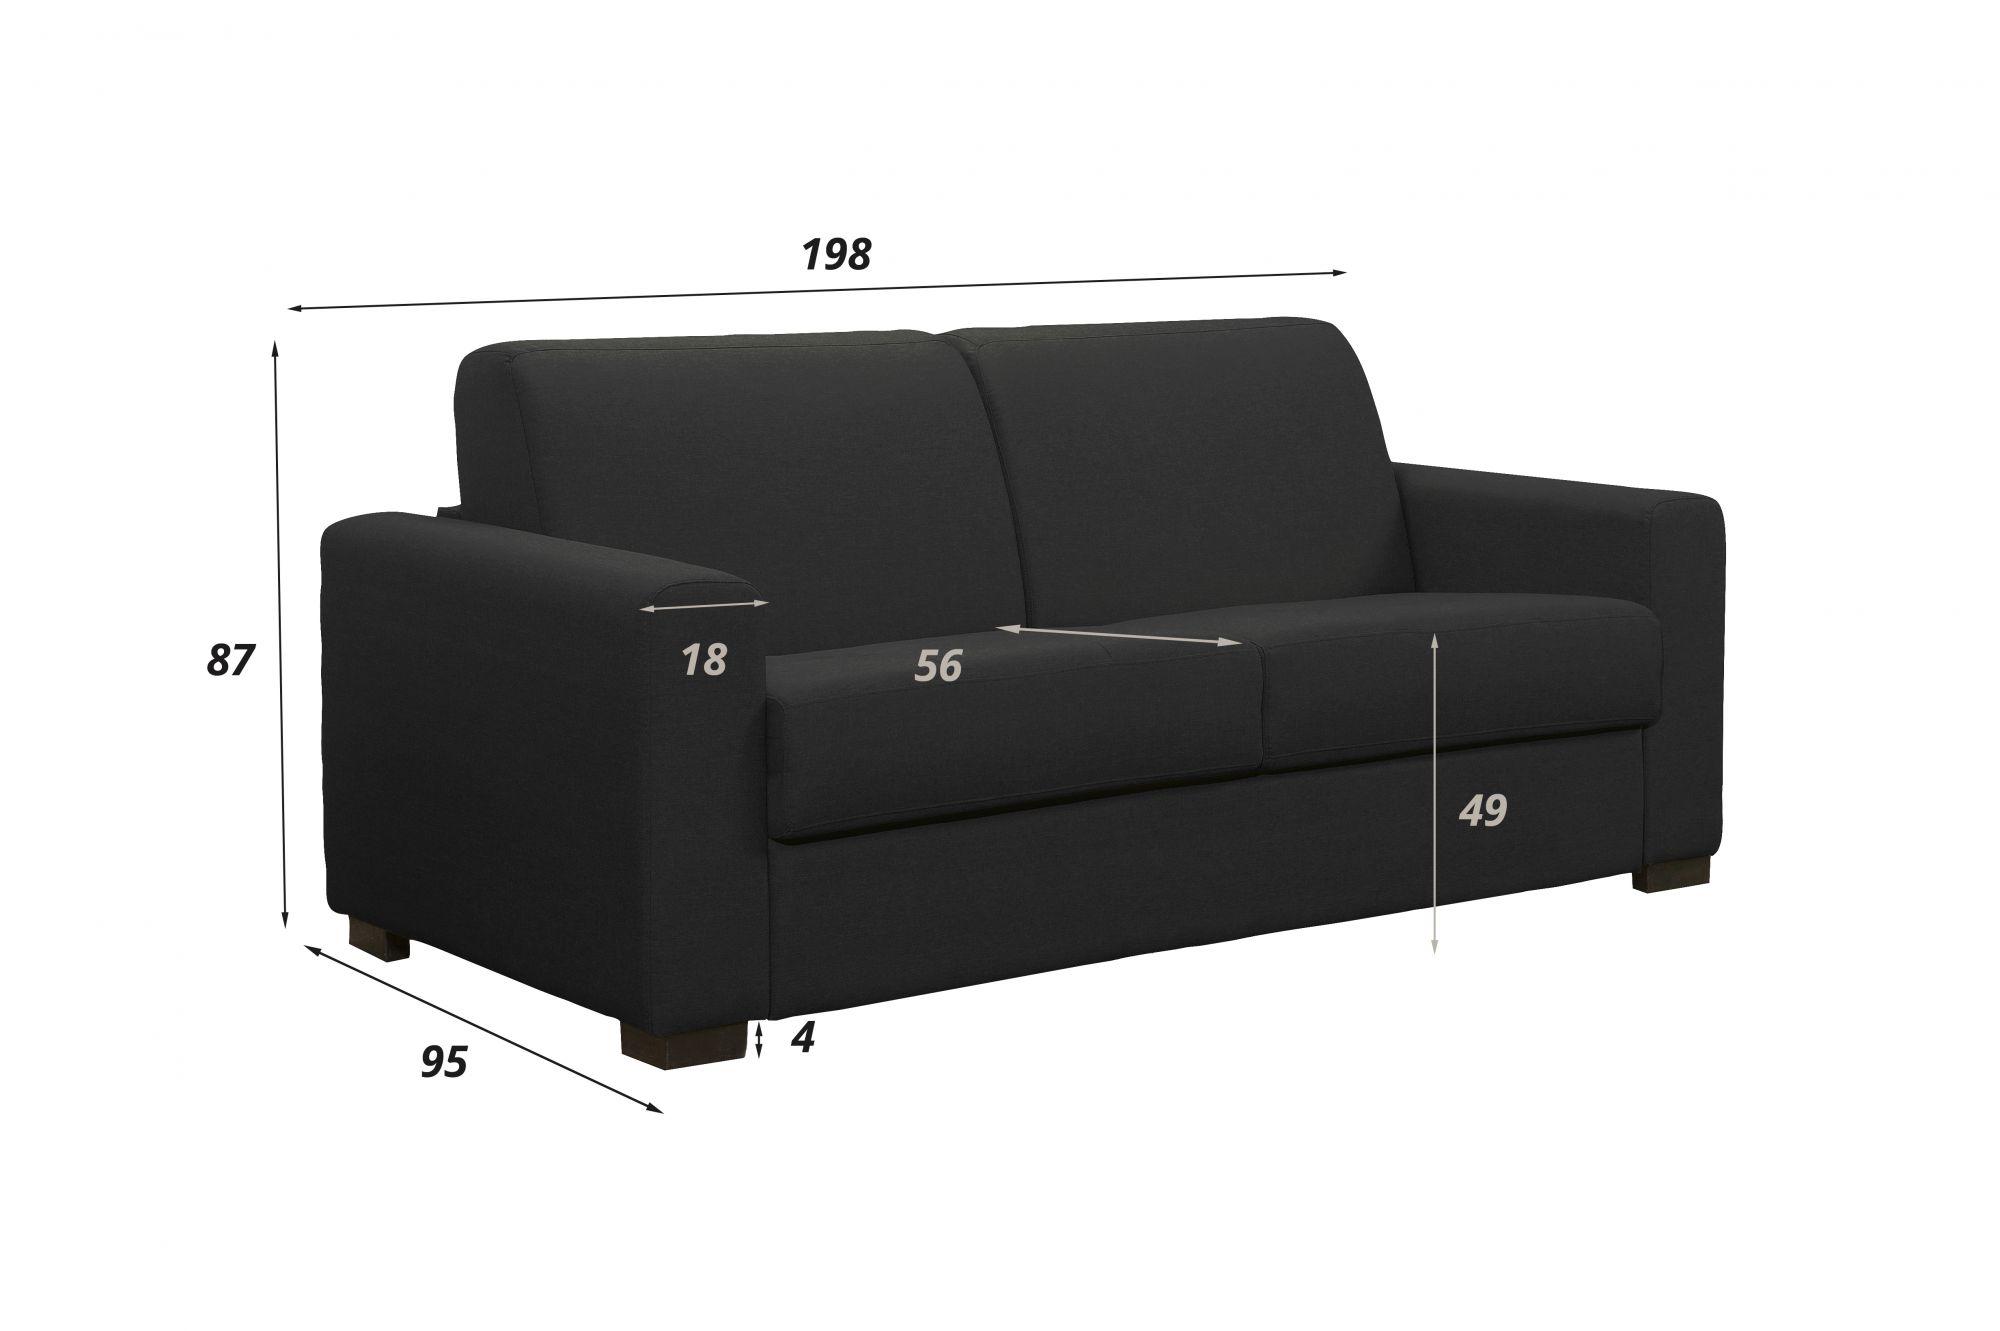 Convertible rapido BOLOTEX couchage 140cm MATELAS BULTEX 12cm